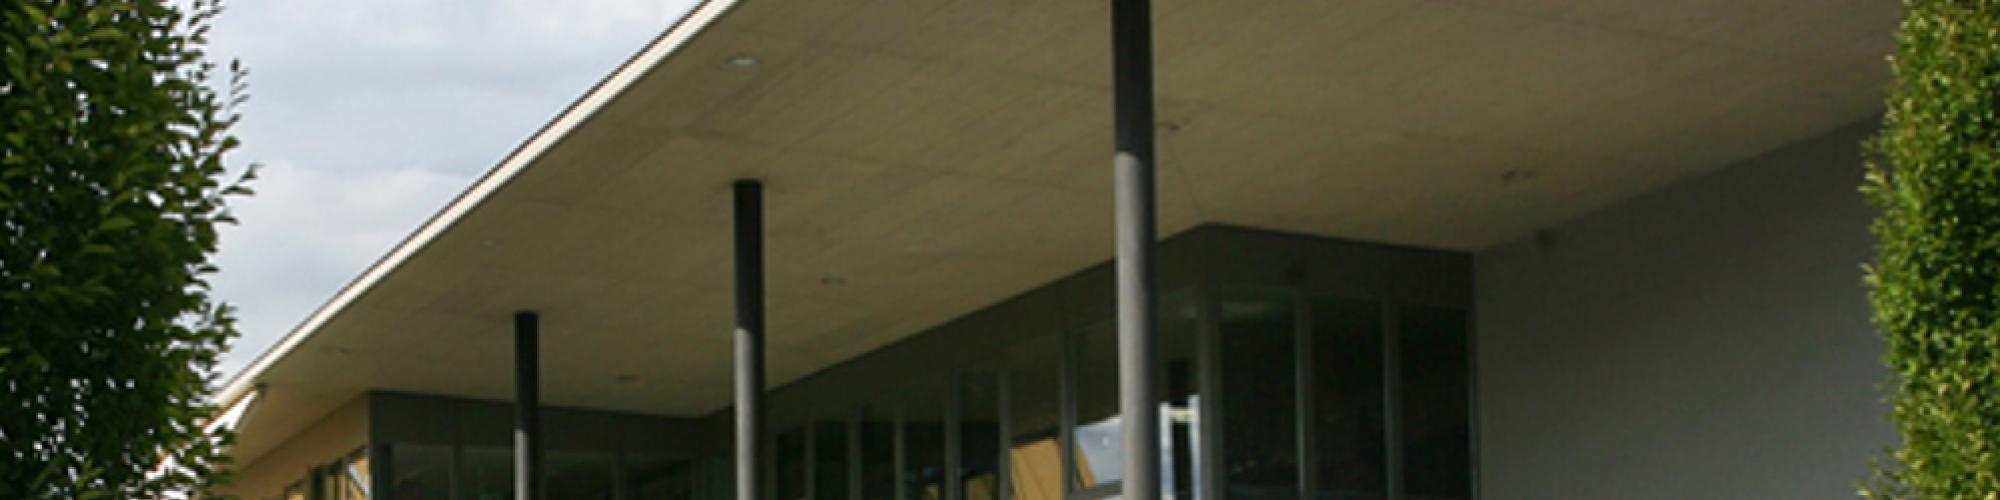 Brühlgut Stiftung